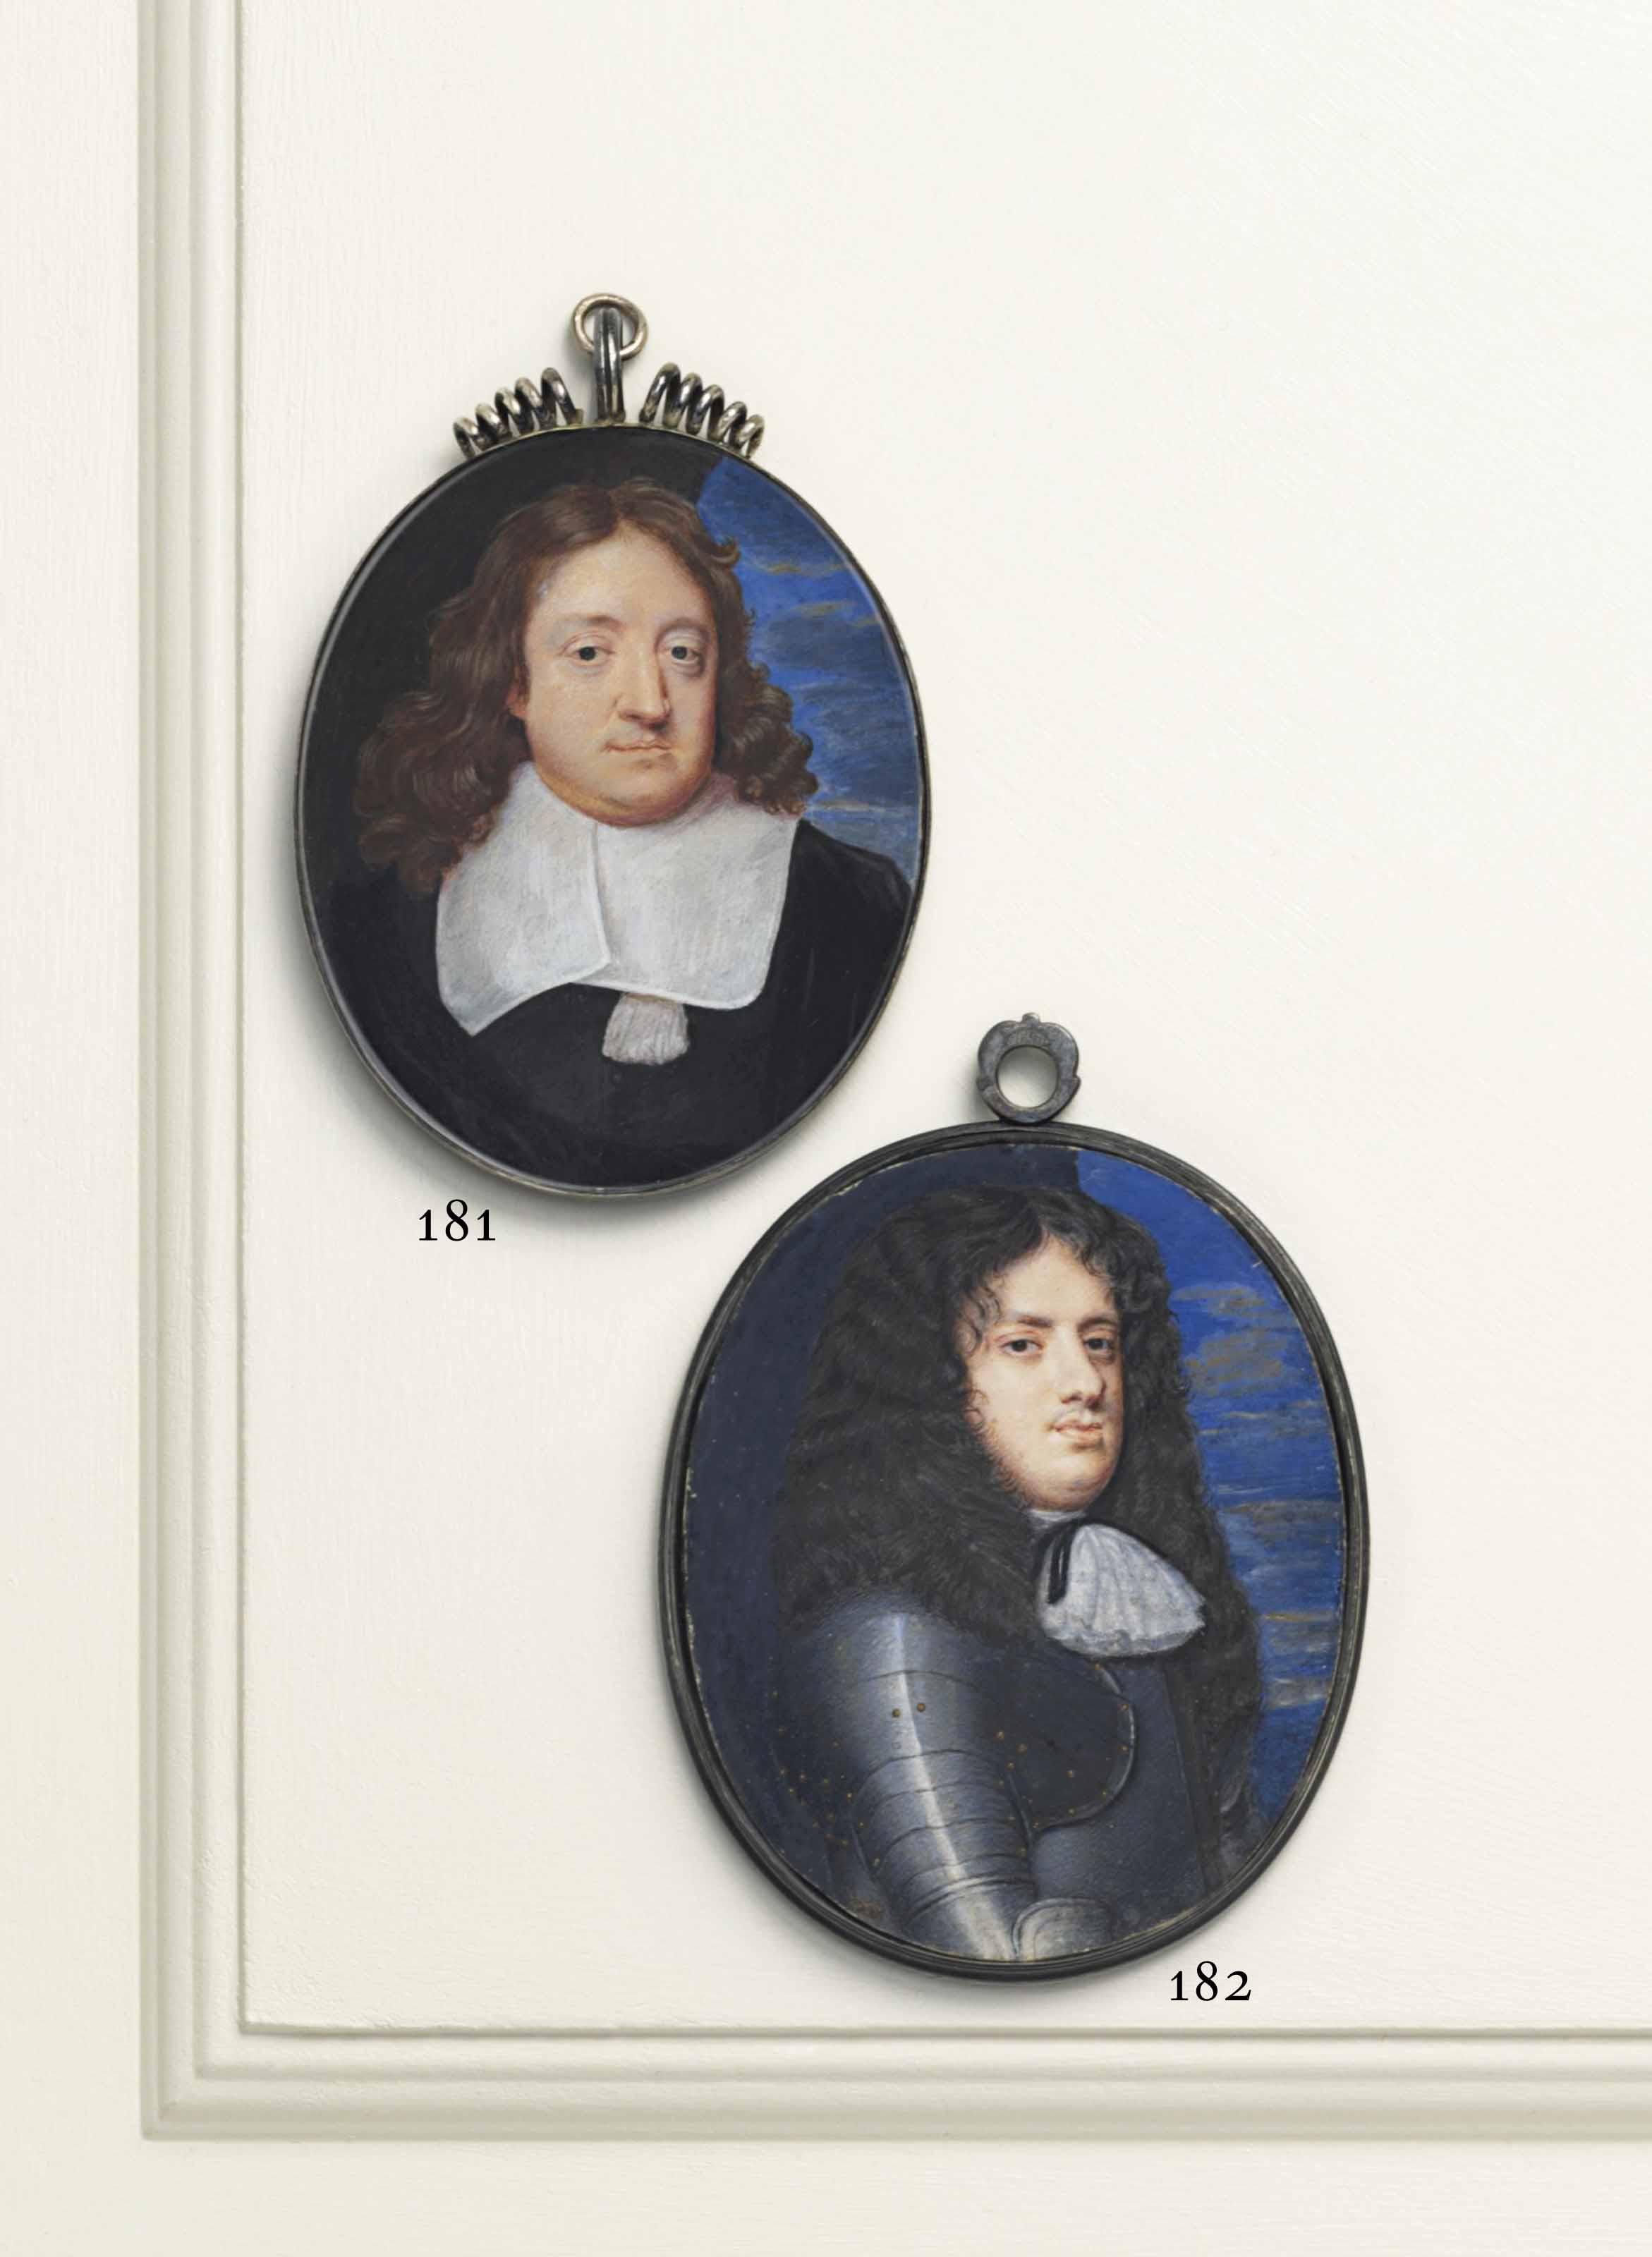 SUSAN PENELOPE ROSSE (BRITISH, C. 1652-1700) AFTER SAMUEL COOPER (BRITISH, 1609-1672)